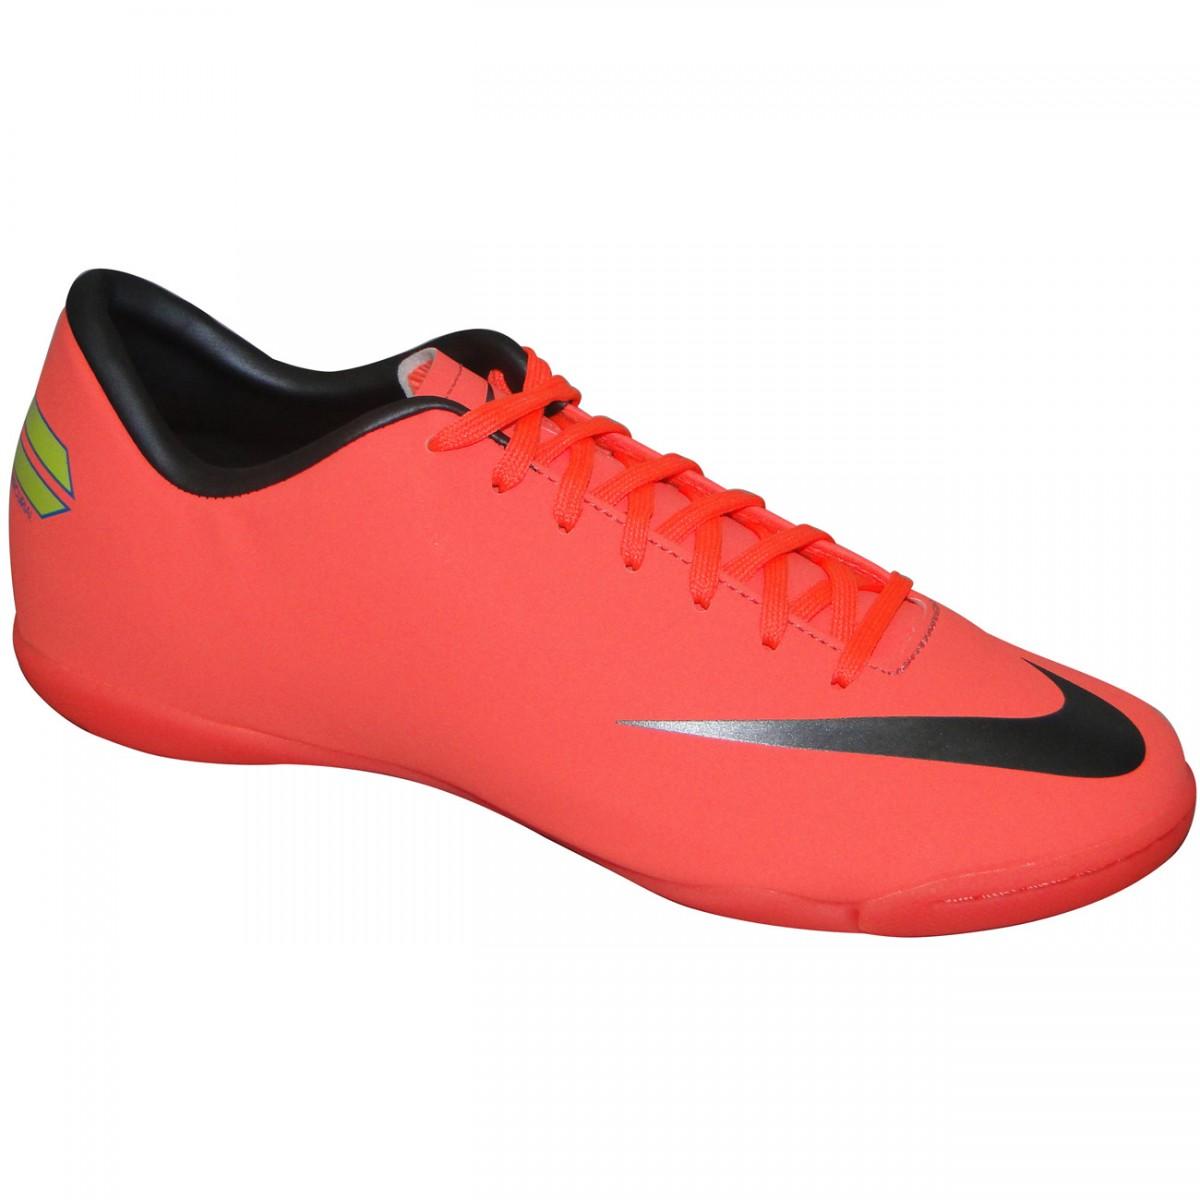 b0211bbfc5204 Tênis Nike Mercurial Victory Iii 2931 - SALMÃO - Chuteira Nike ...